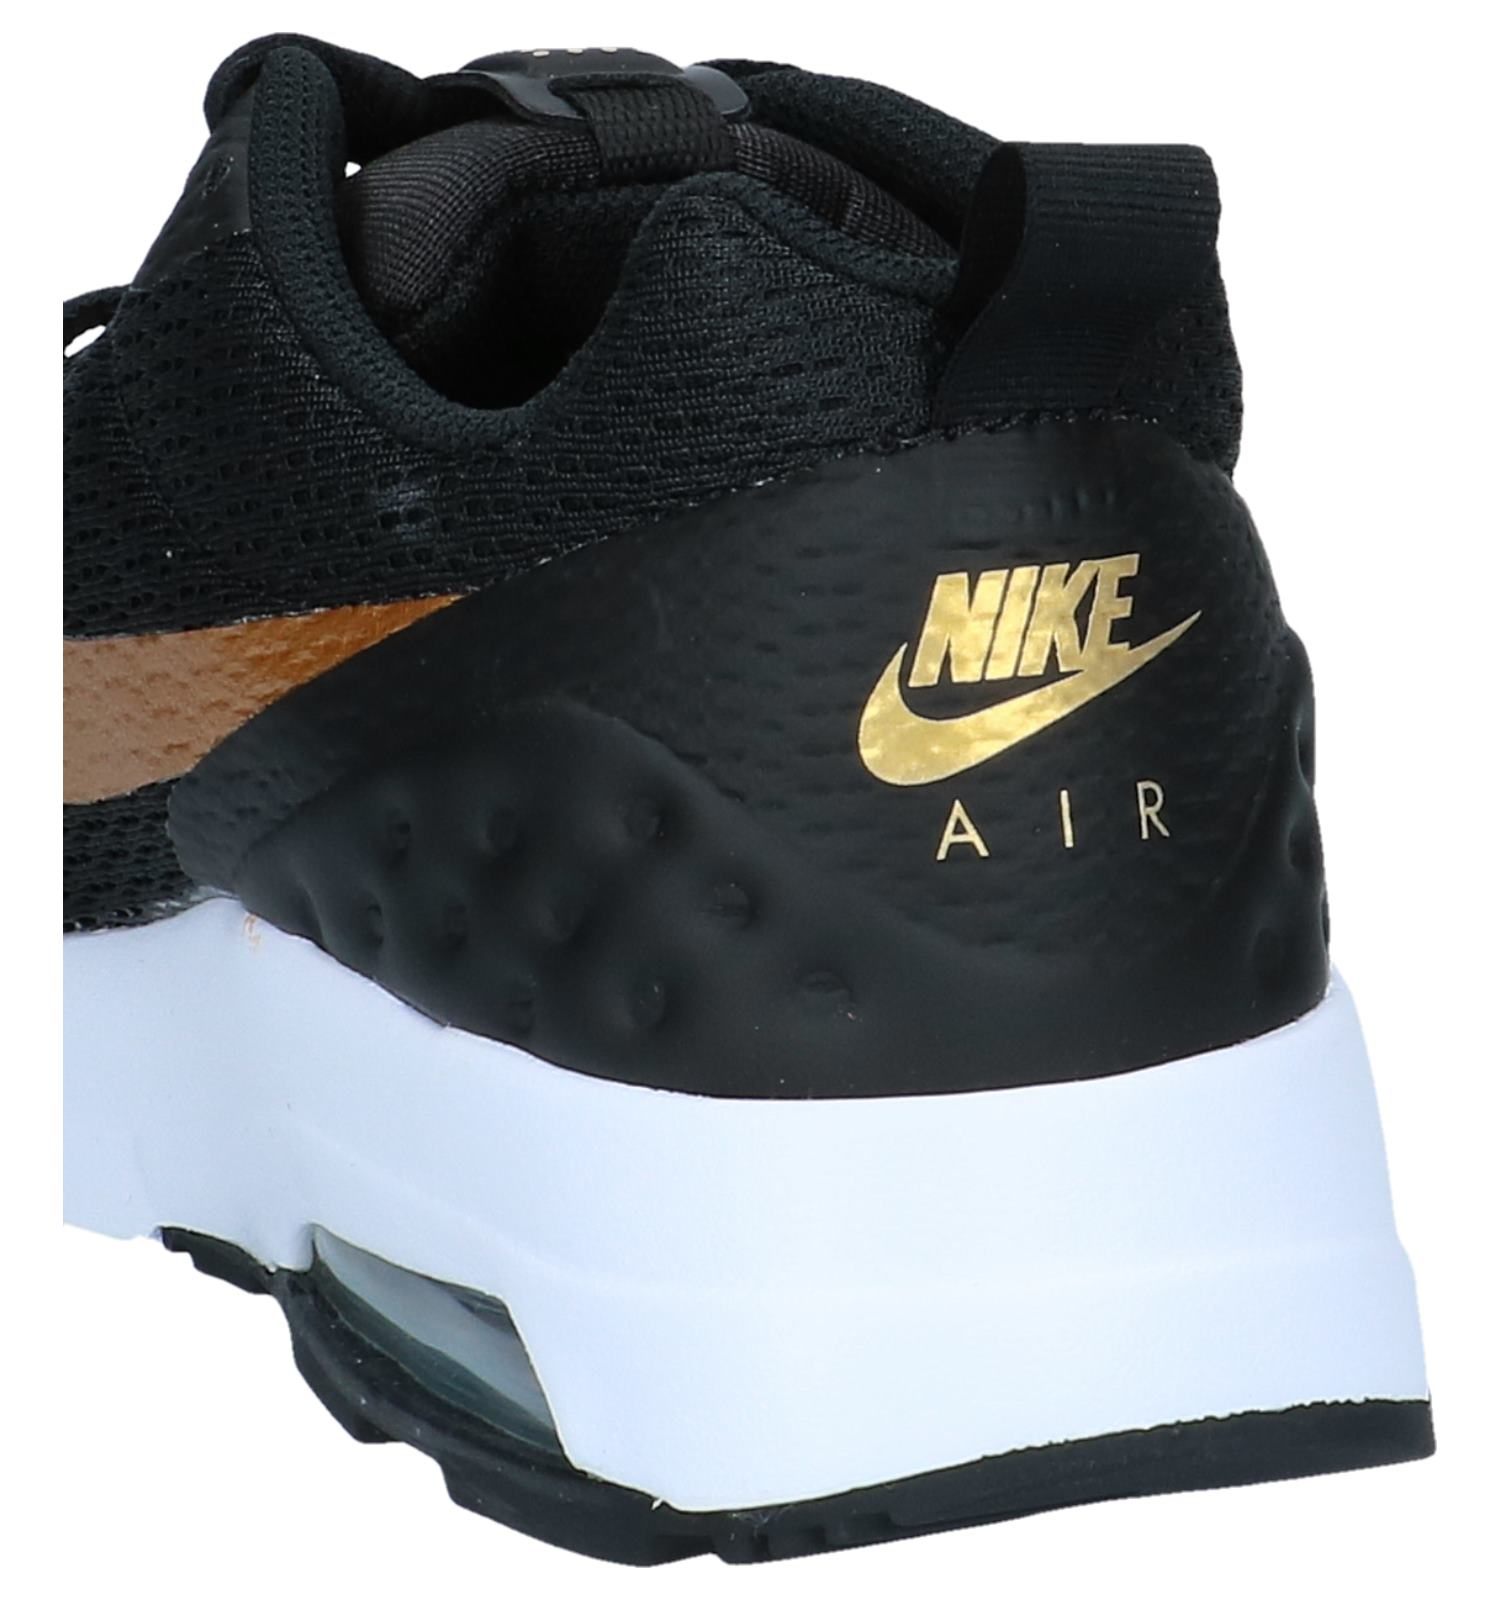 new products 369d0 21f3f Zwarte Nike Air Max 16 UL Sneakers  TORFS.BE  Gratis verzend